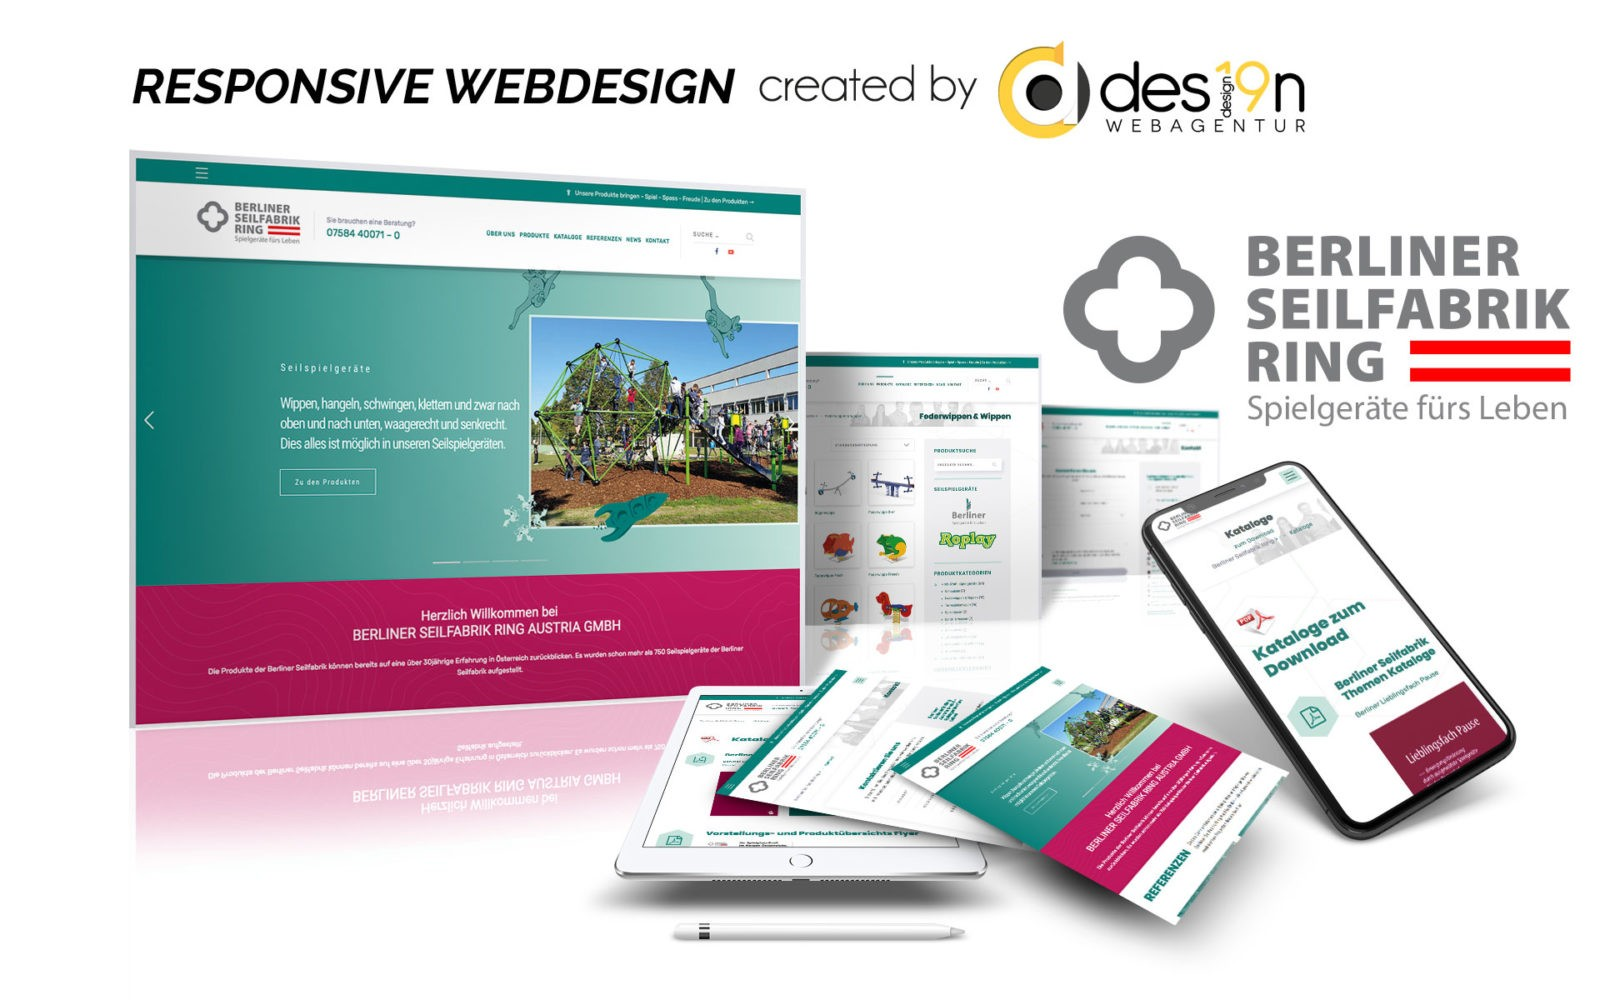 Responsive Webdesign Berliner Seilfabrik Ring Austria GmbH